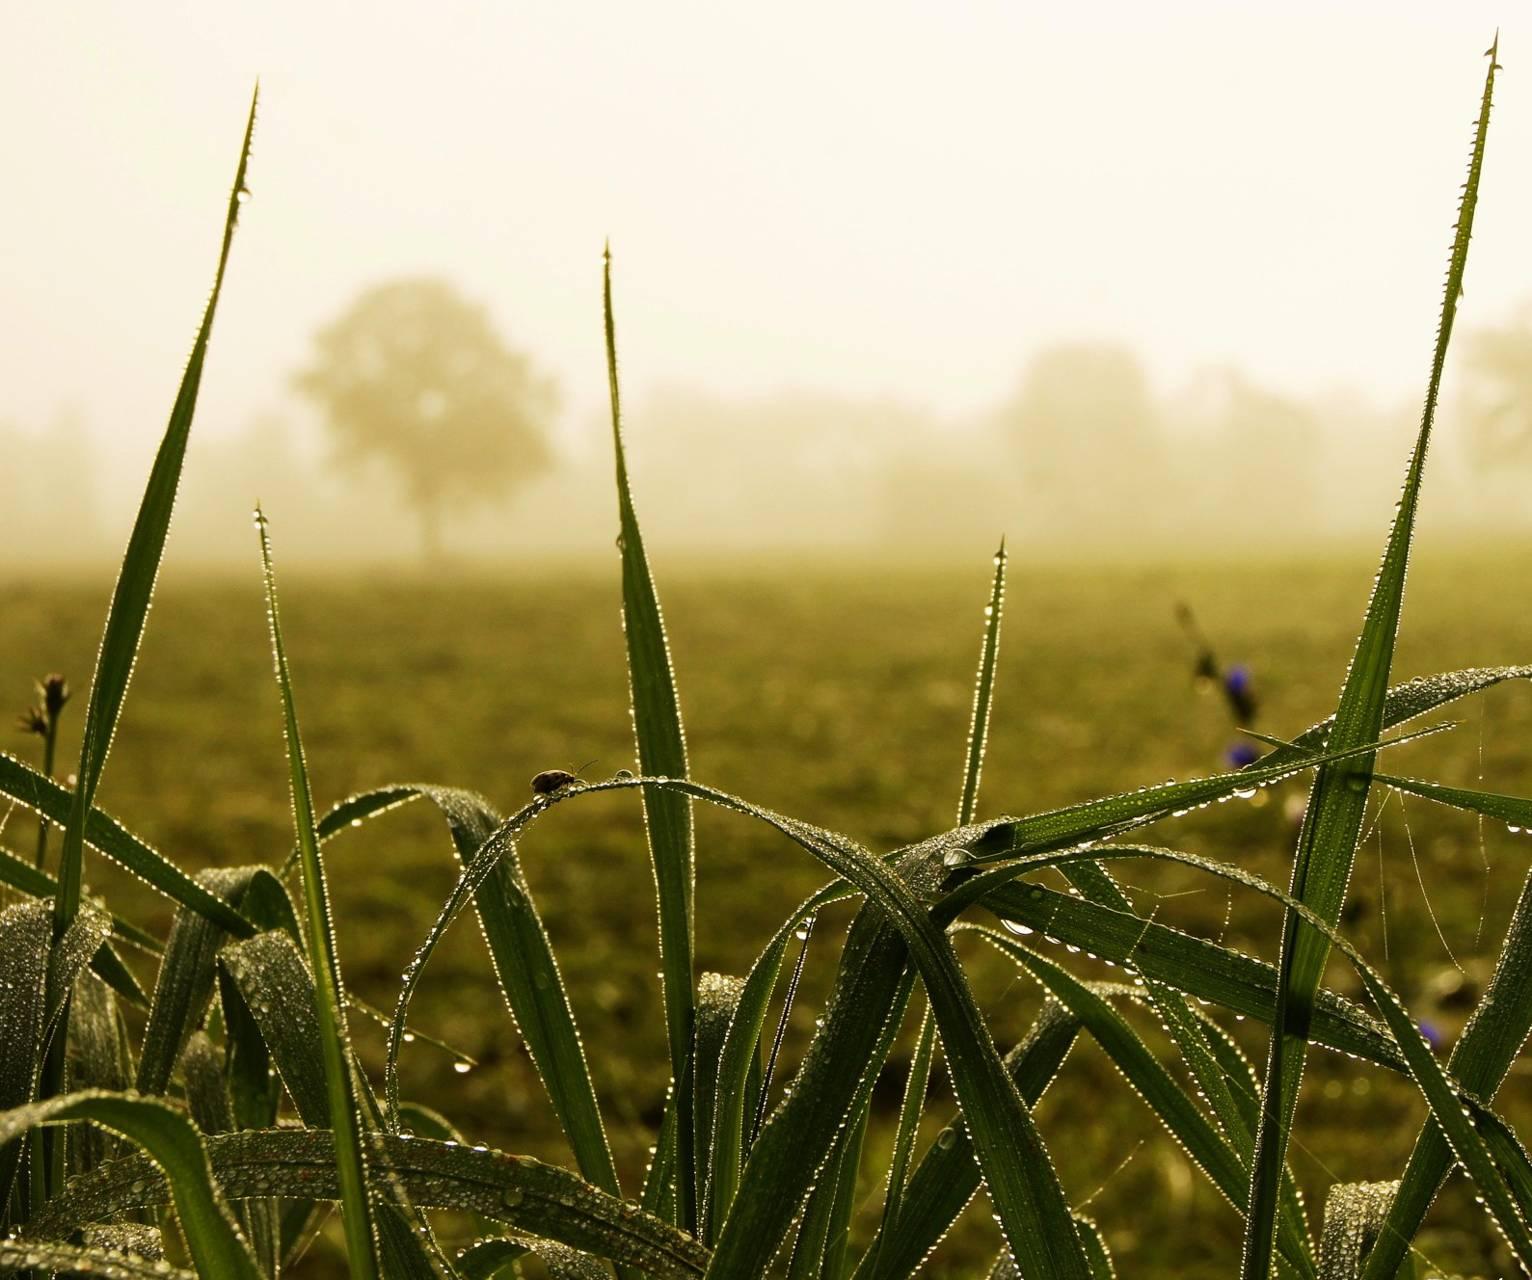 Grassy Fog